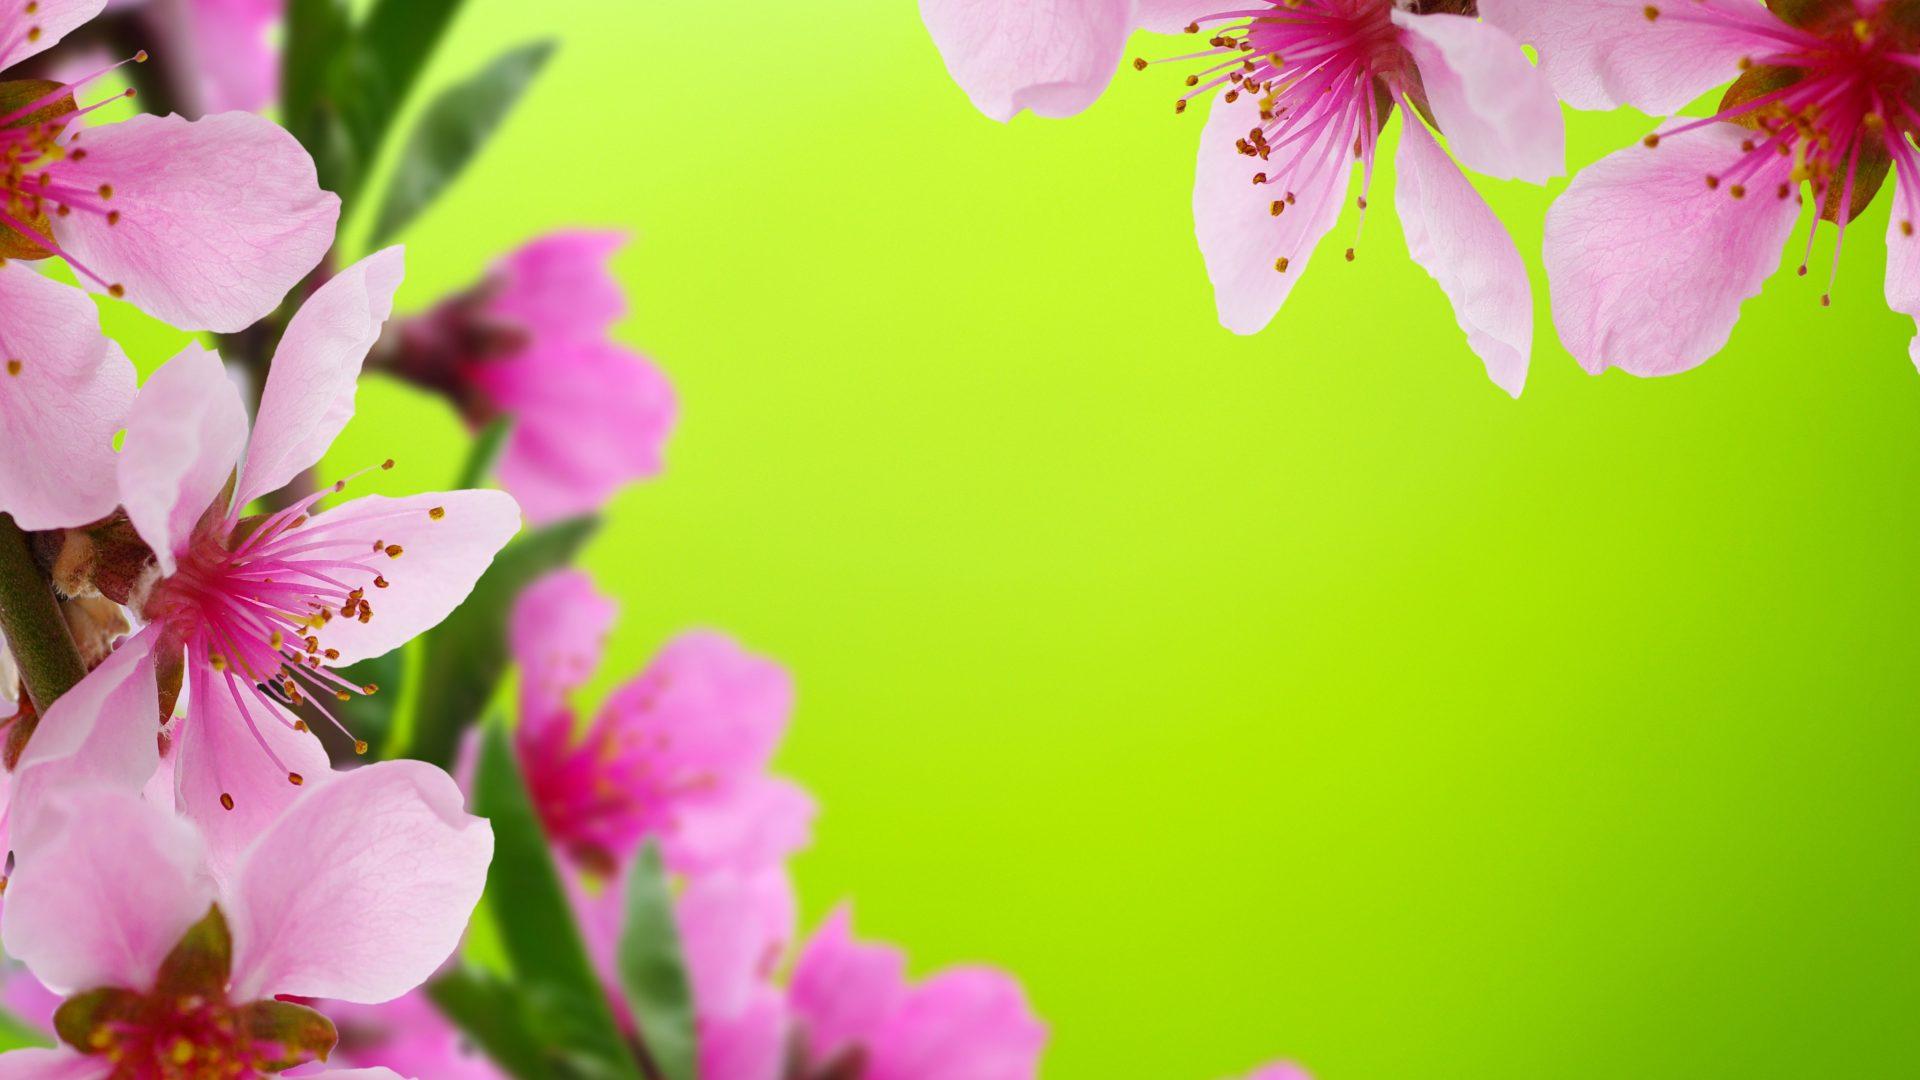 Beautiful Flower Wallpapers For Desktop Full Screen